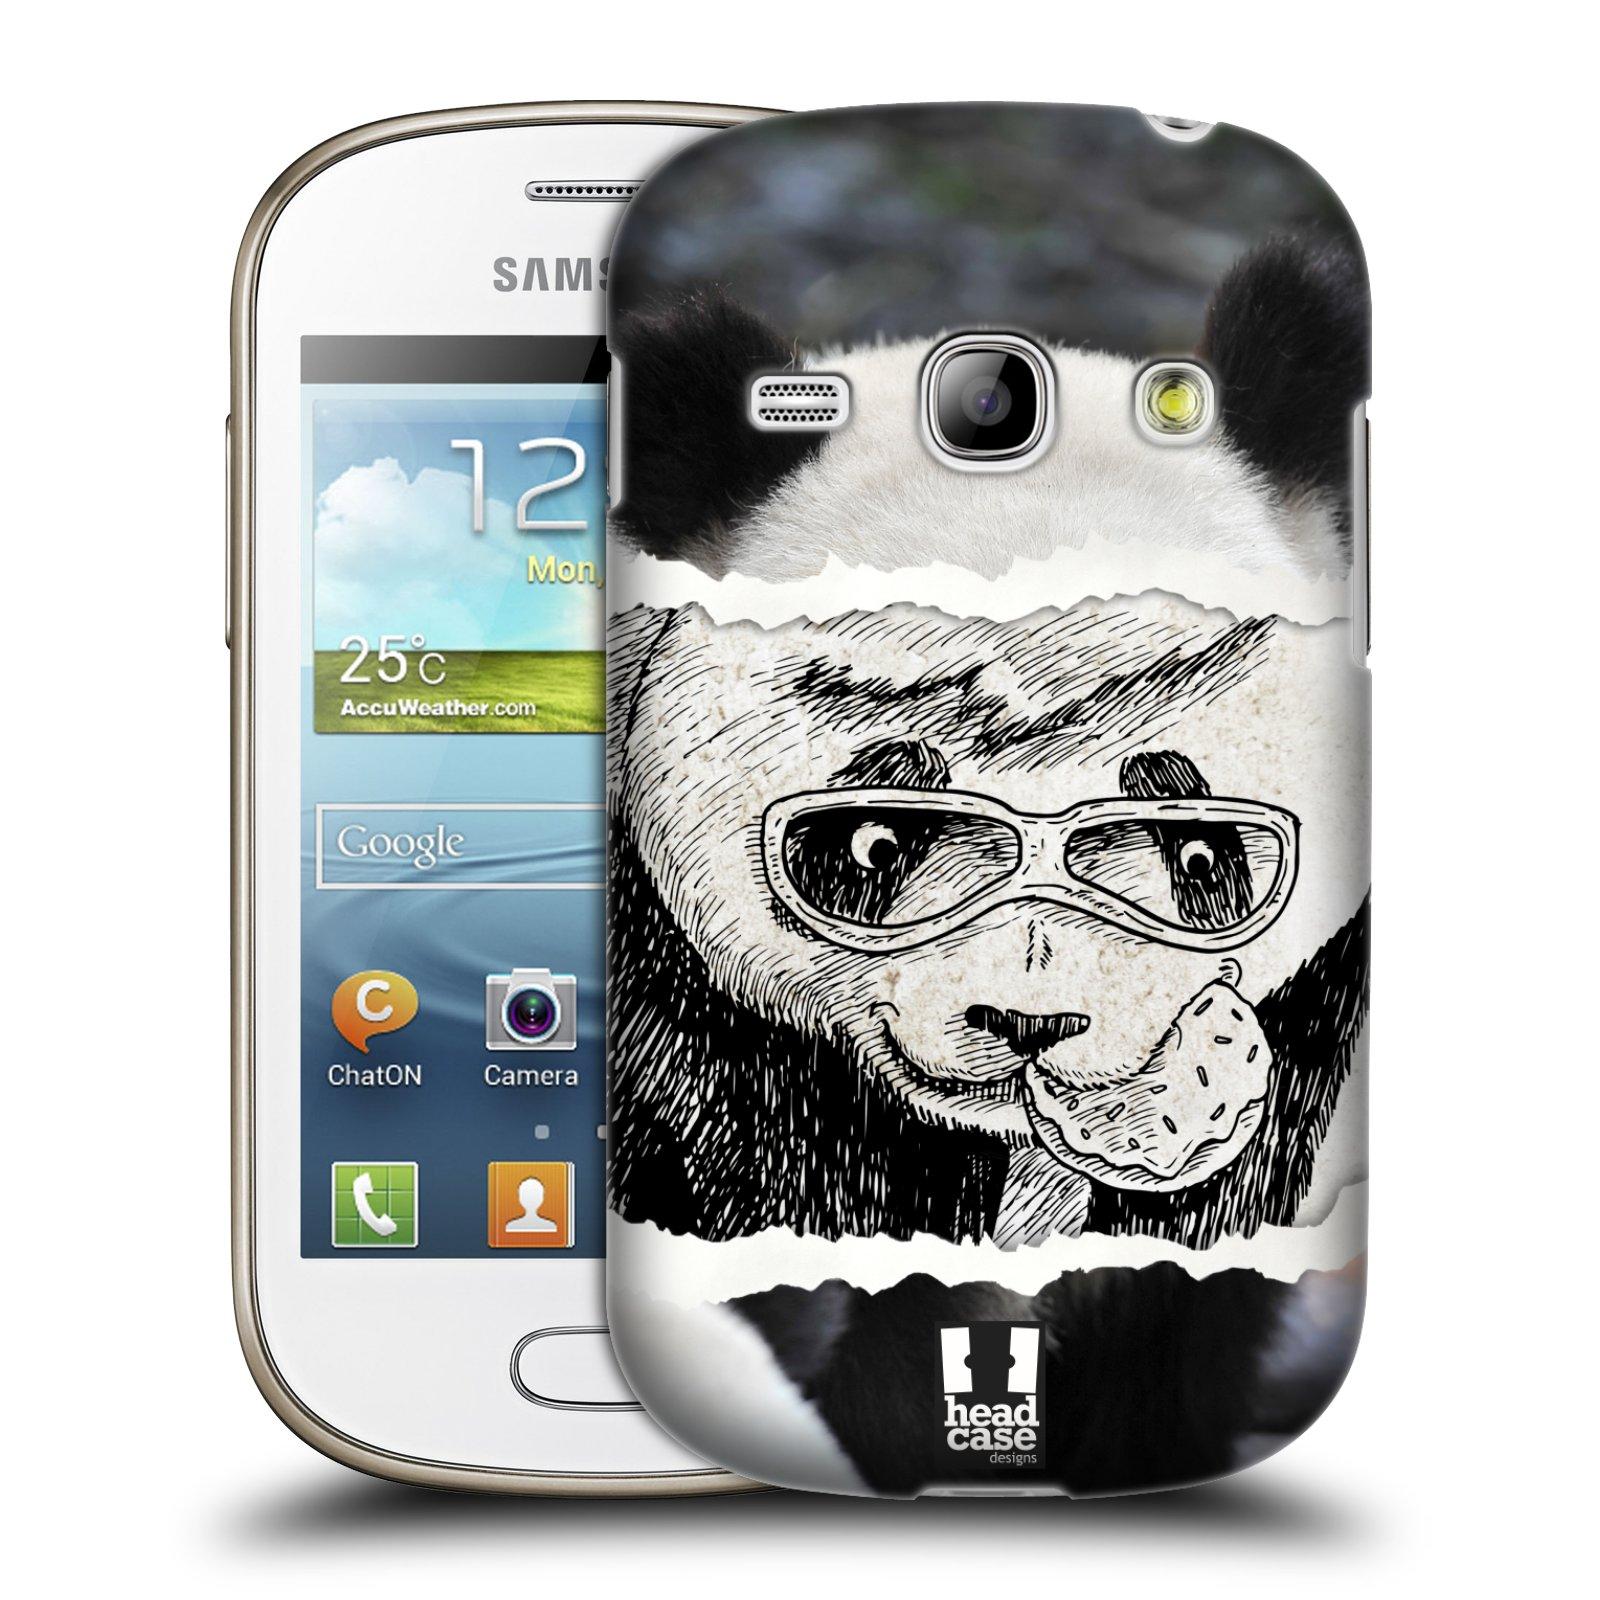 HEAD CASE plastový obal na mobil SAMSUNG GALAXY FAME (S6810) vzor zvířata koláž roztomilá panda